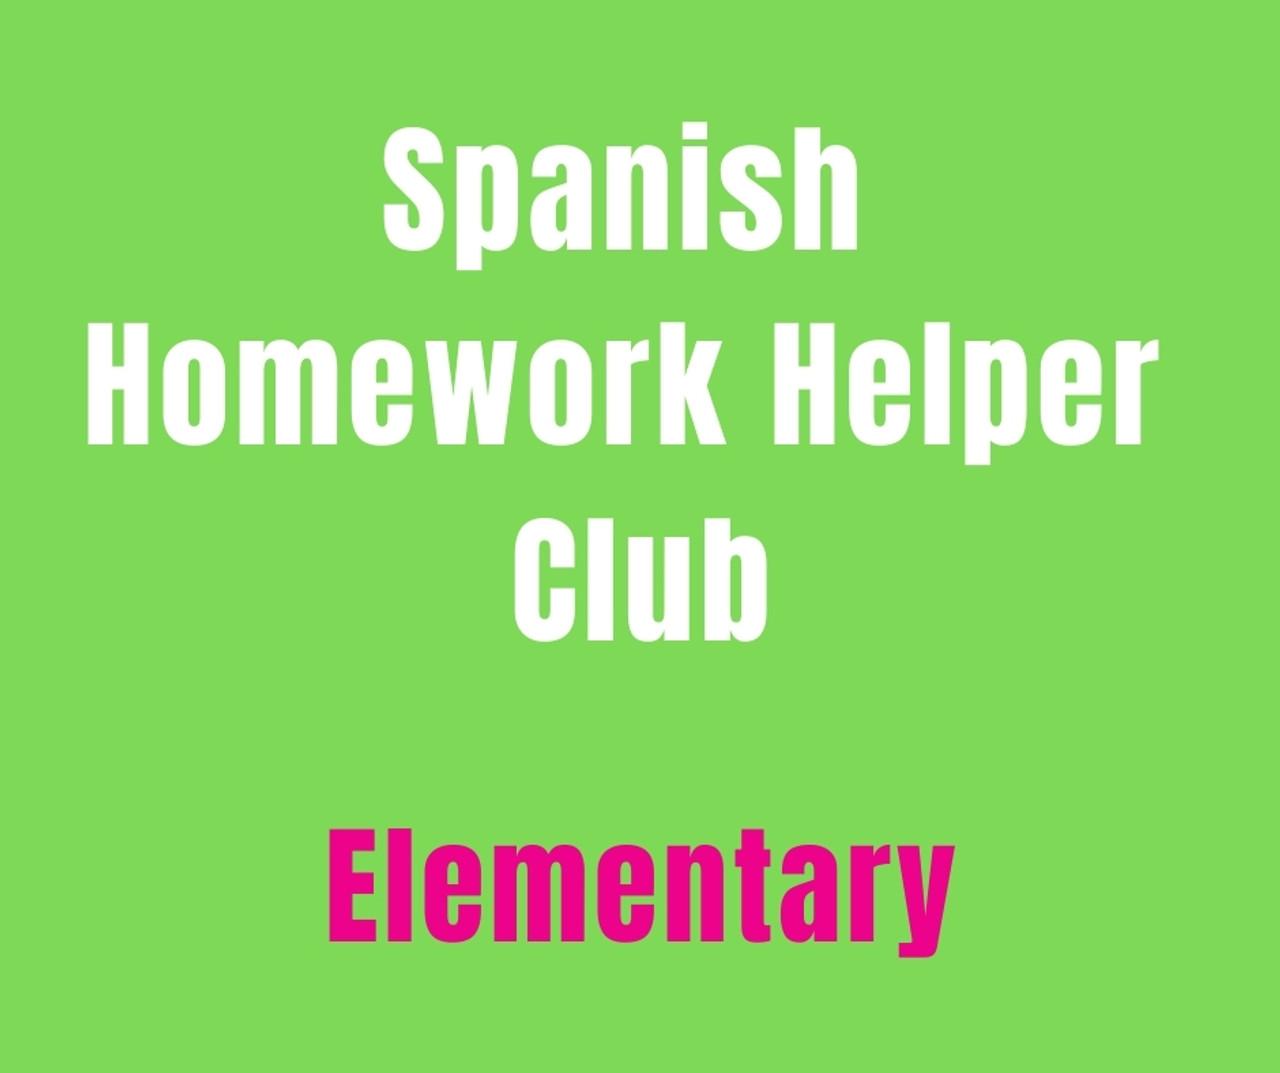 small resolution of SPANISH HOMEWORK HELPER CLUB (K-5) ELEMENTARY *LIMITED AVAILABILITY -  Spanishtime